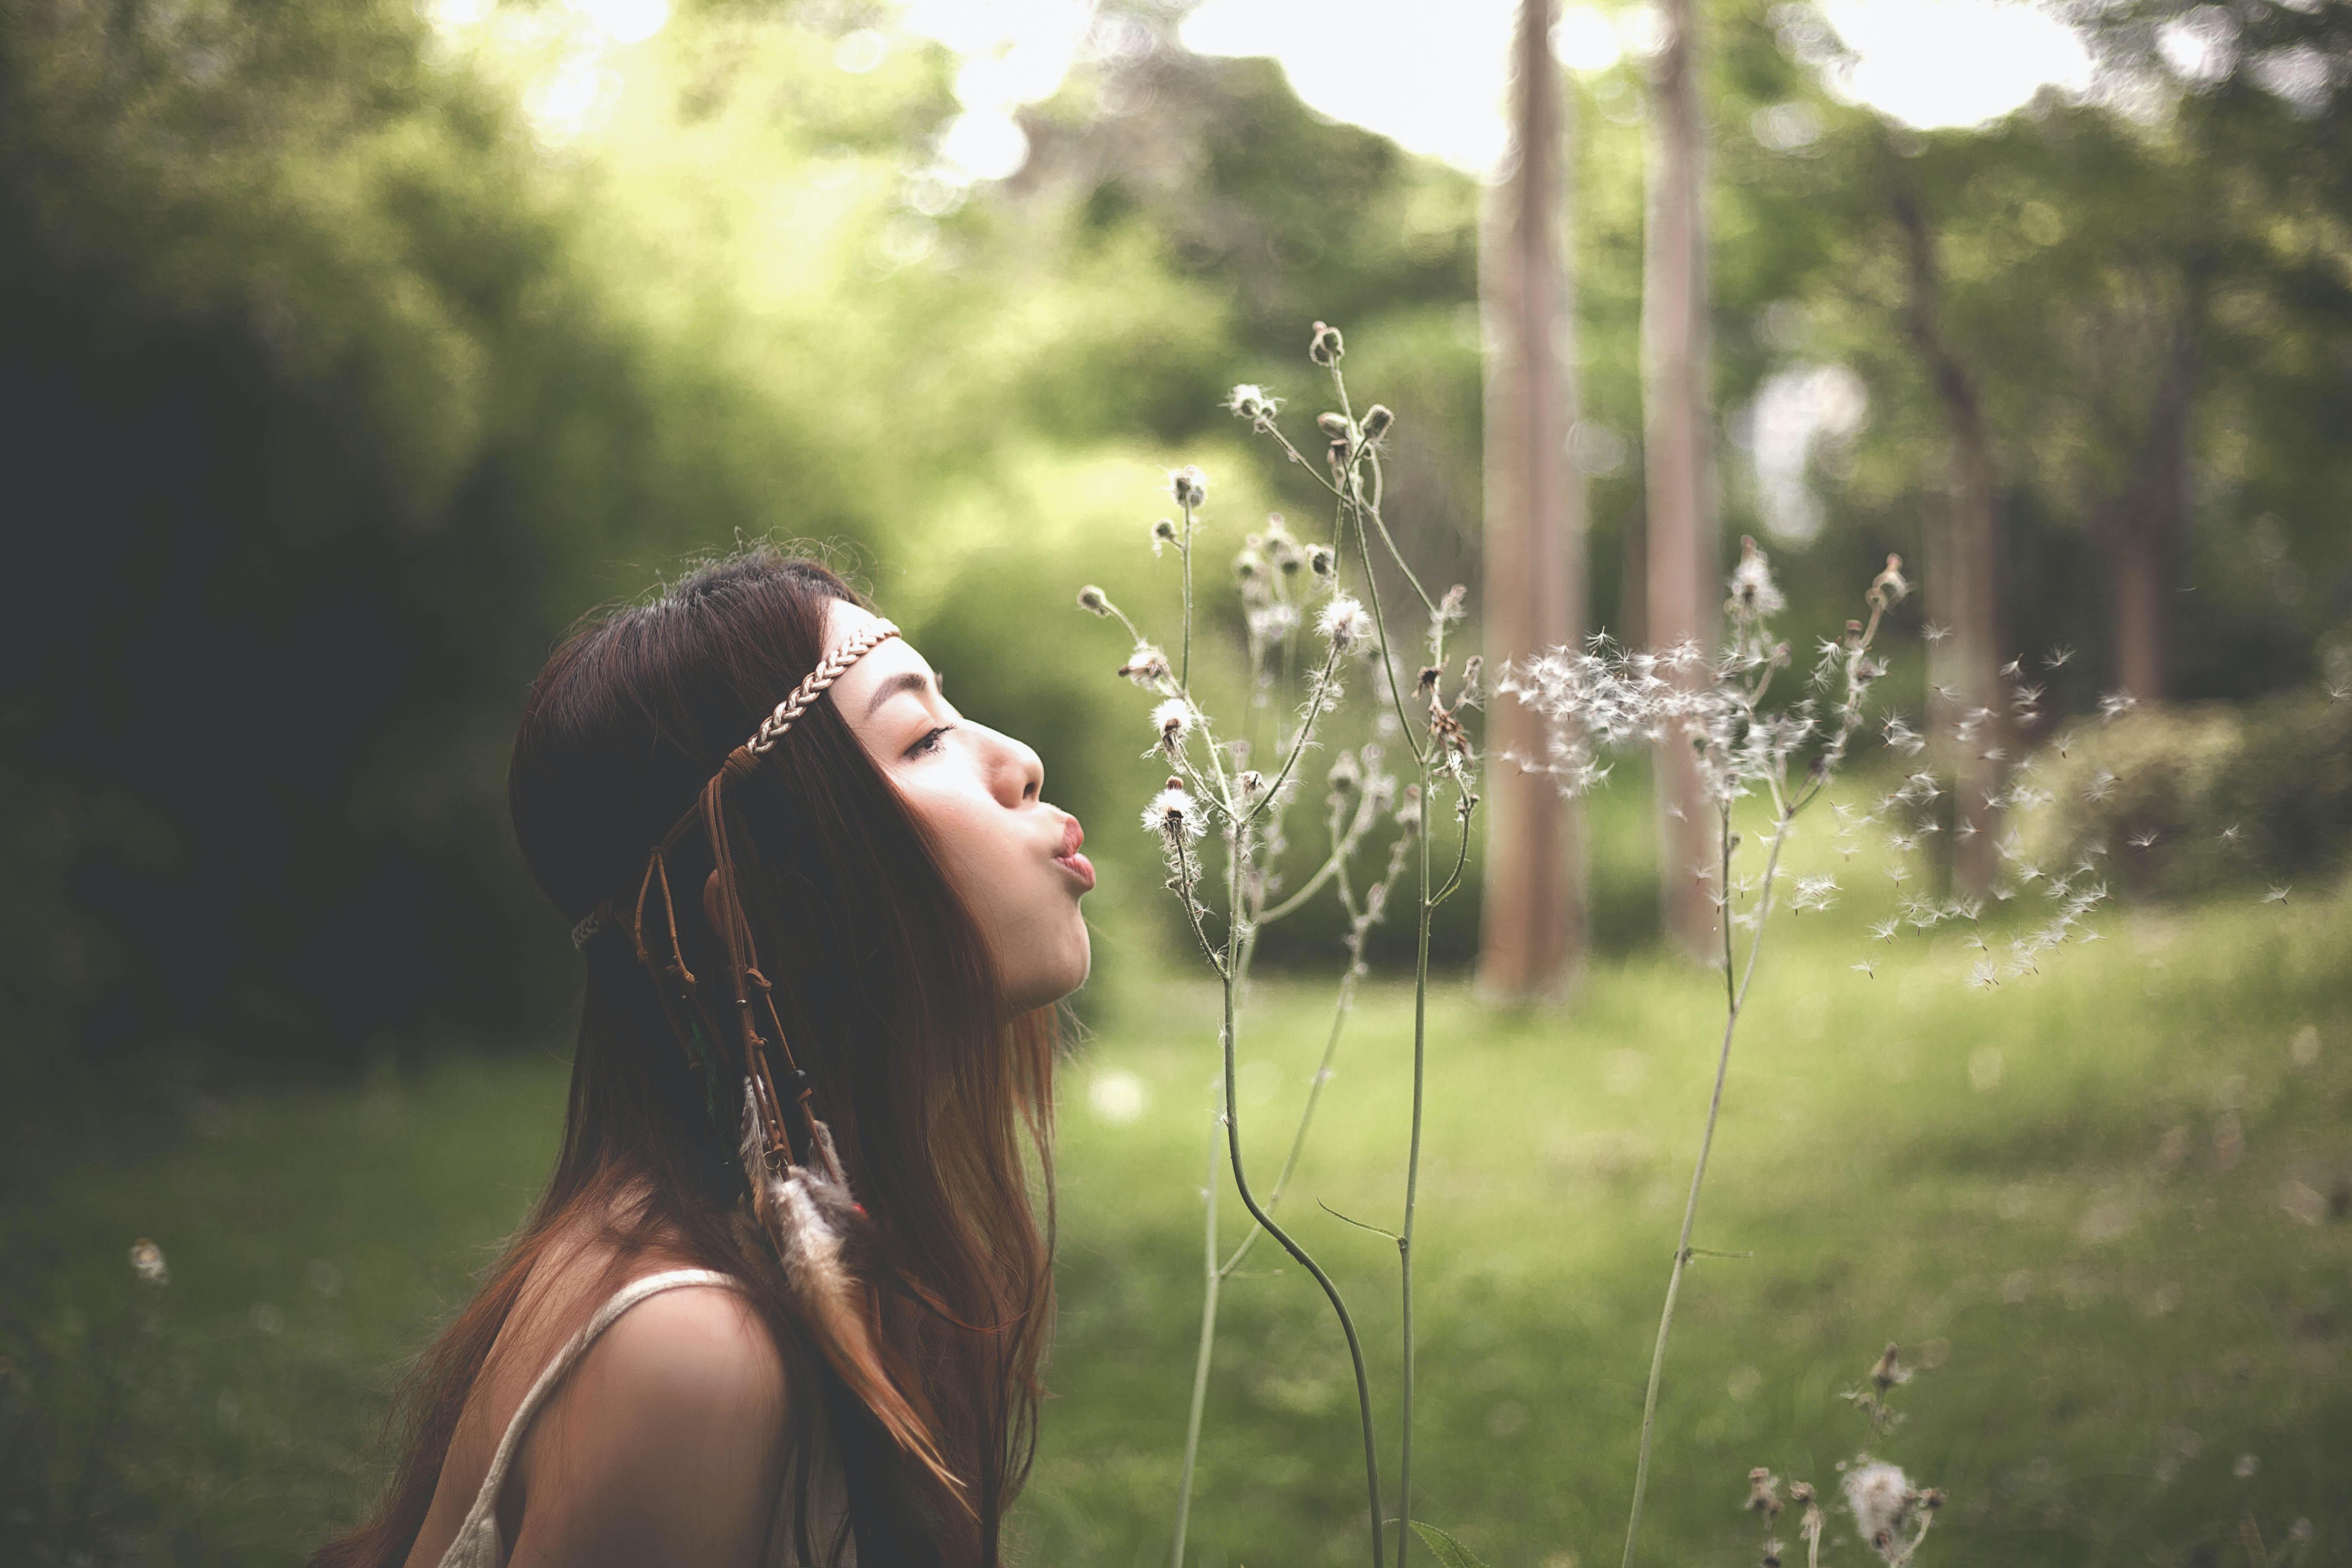 photo of woman blowing dandelion flowers